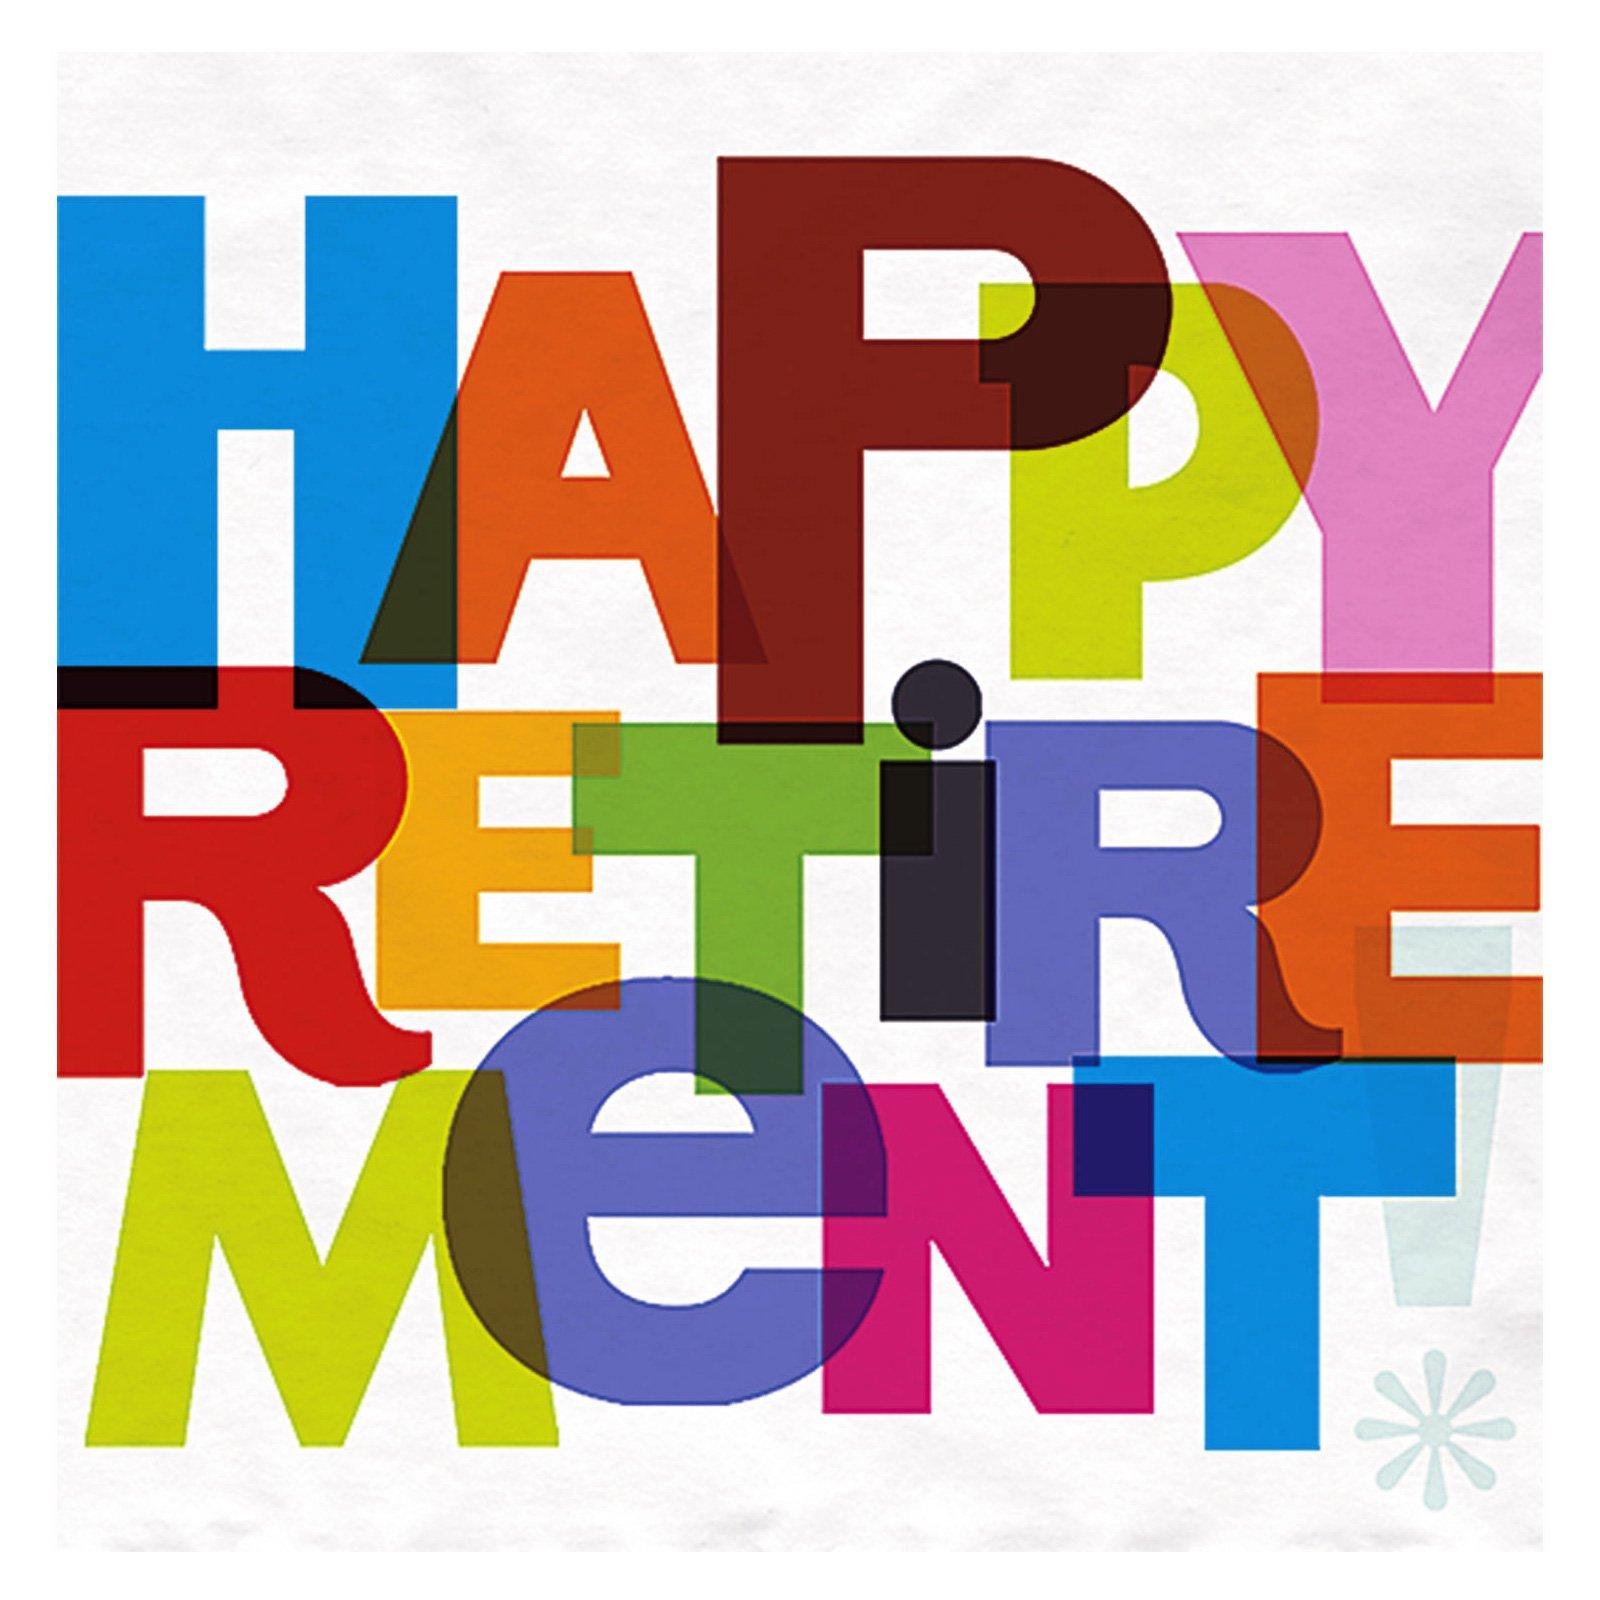 Hammock clipart retirement. Free wedding congratulations clip